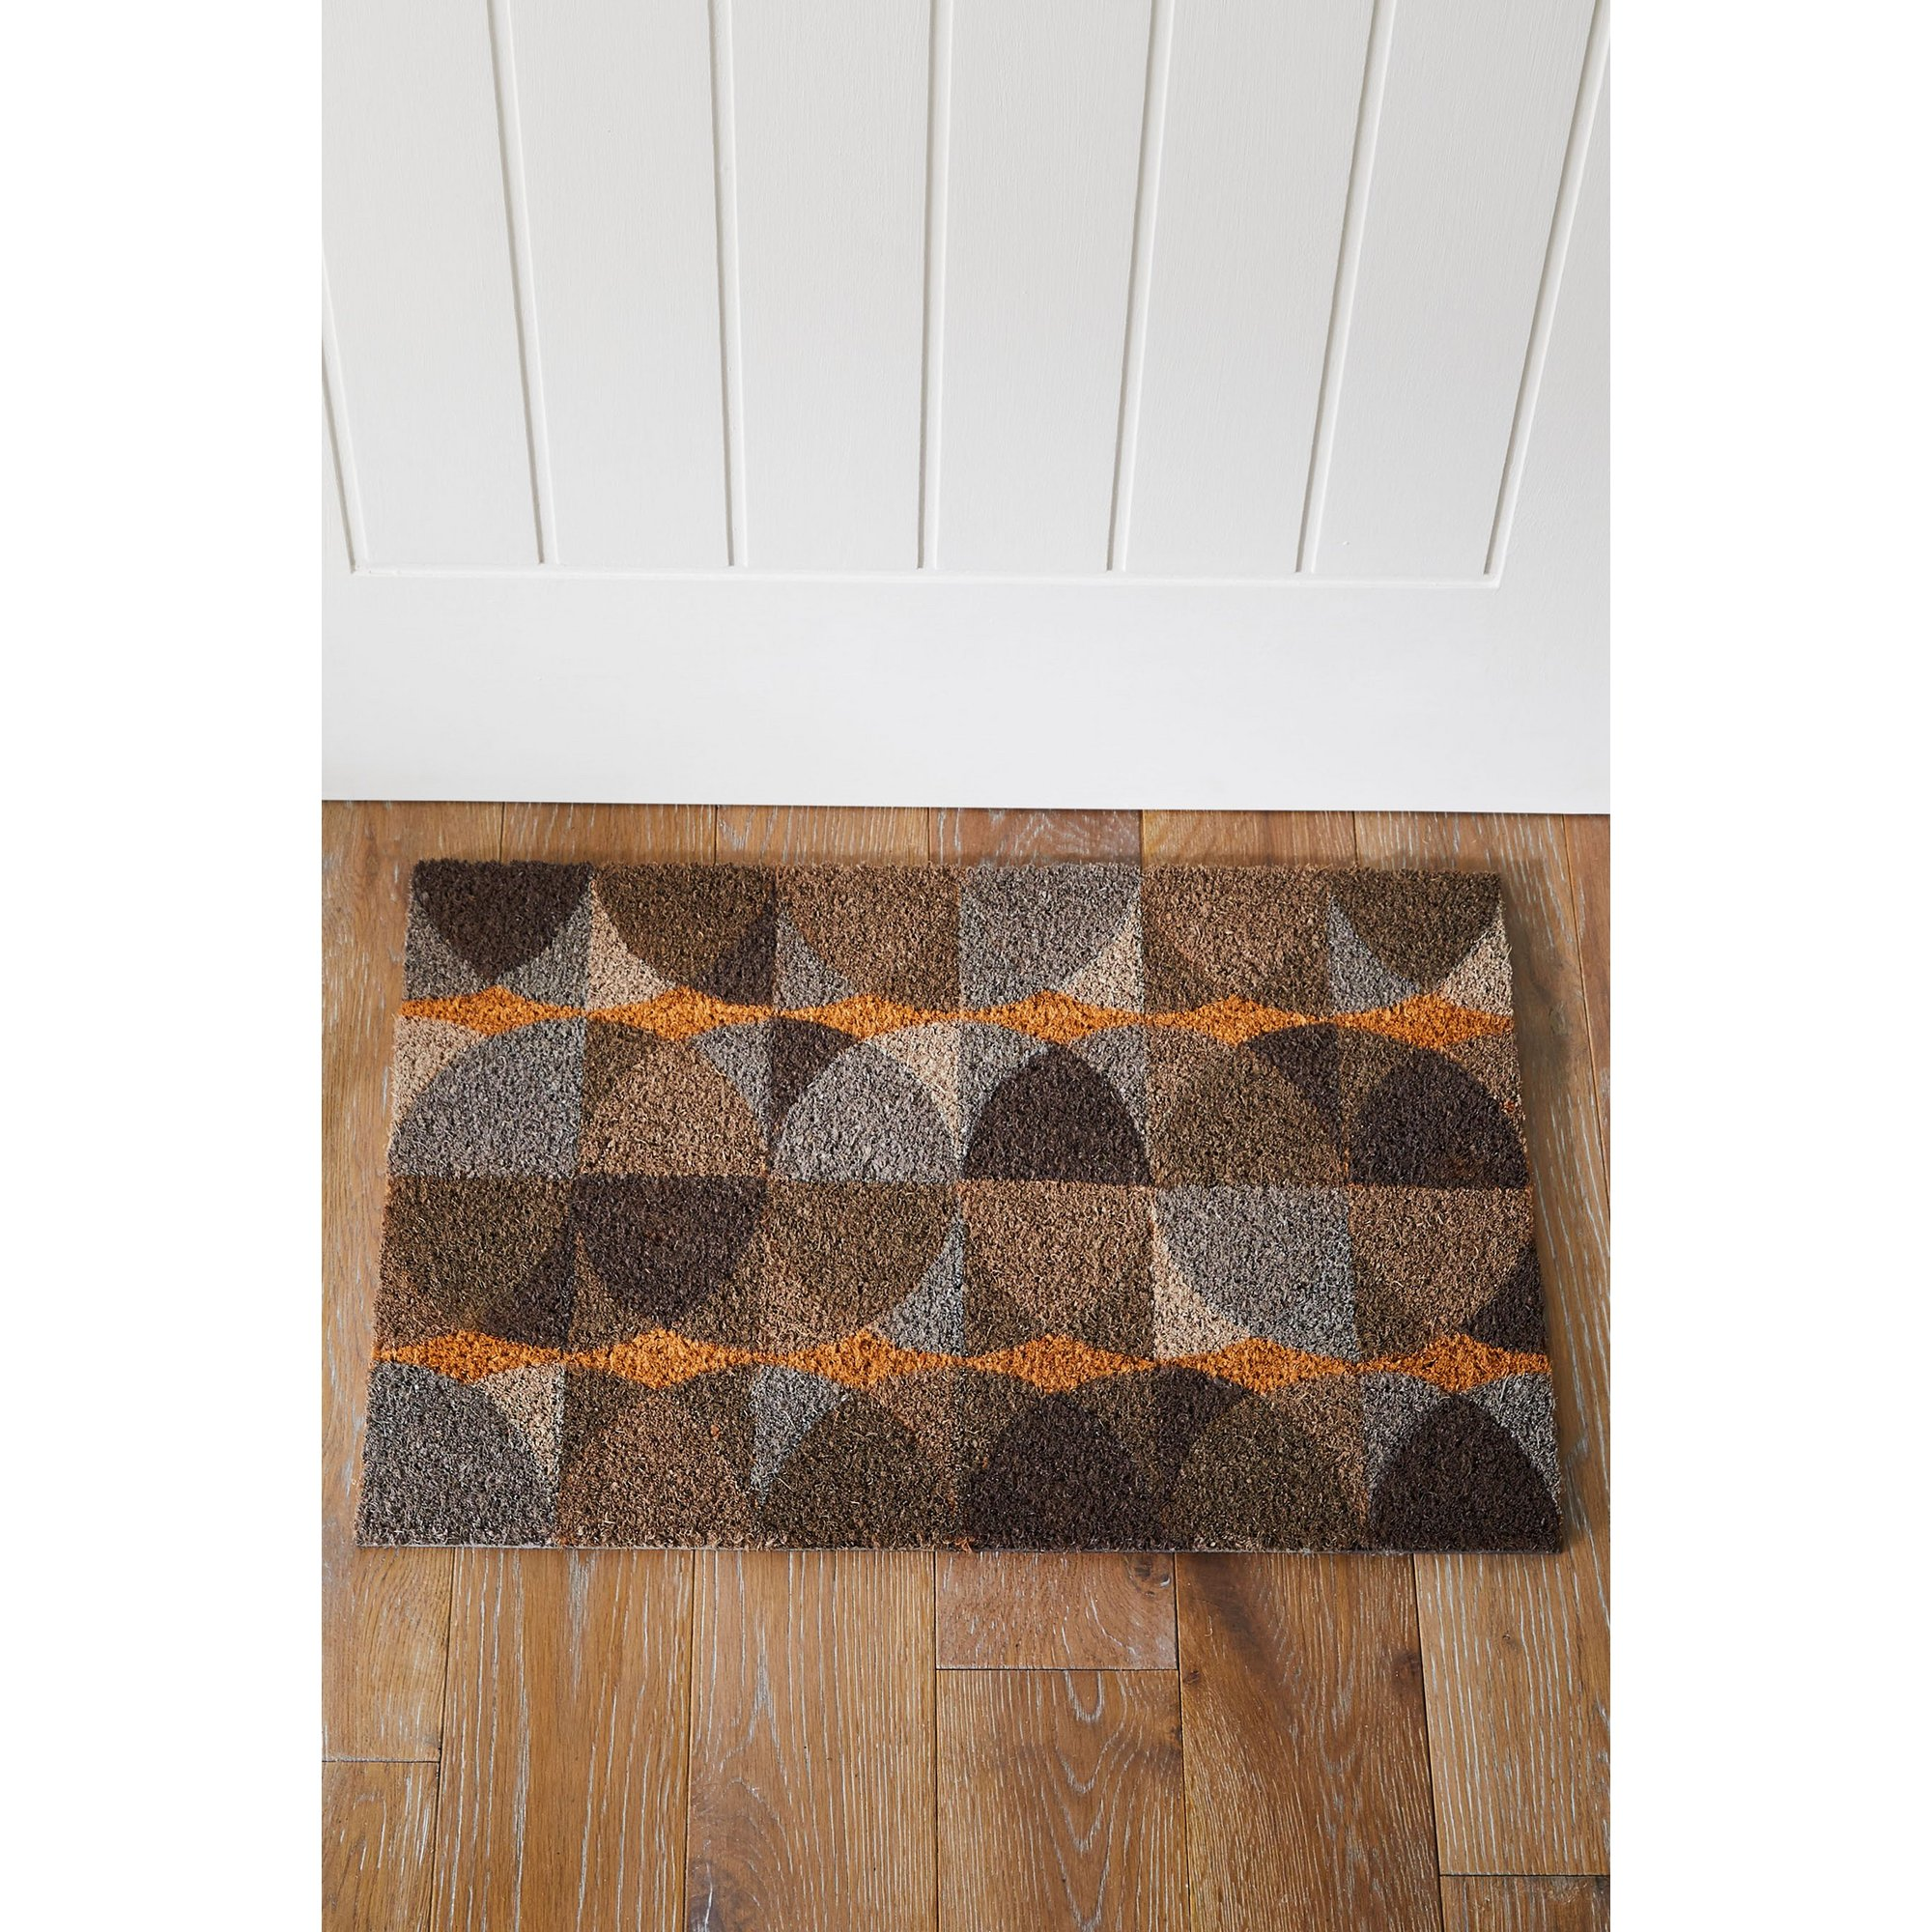 Image of Astley Geo Circles Printed Coir Mat